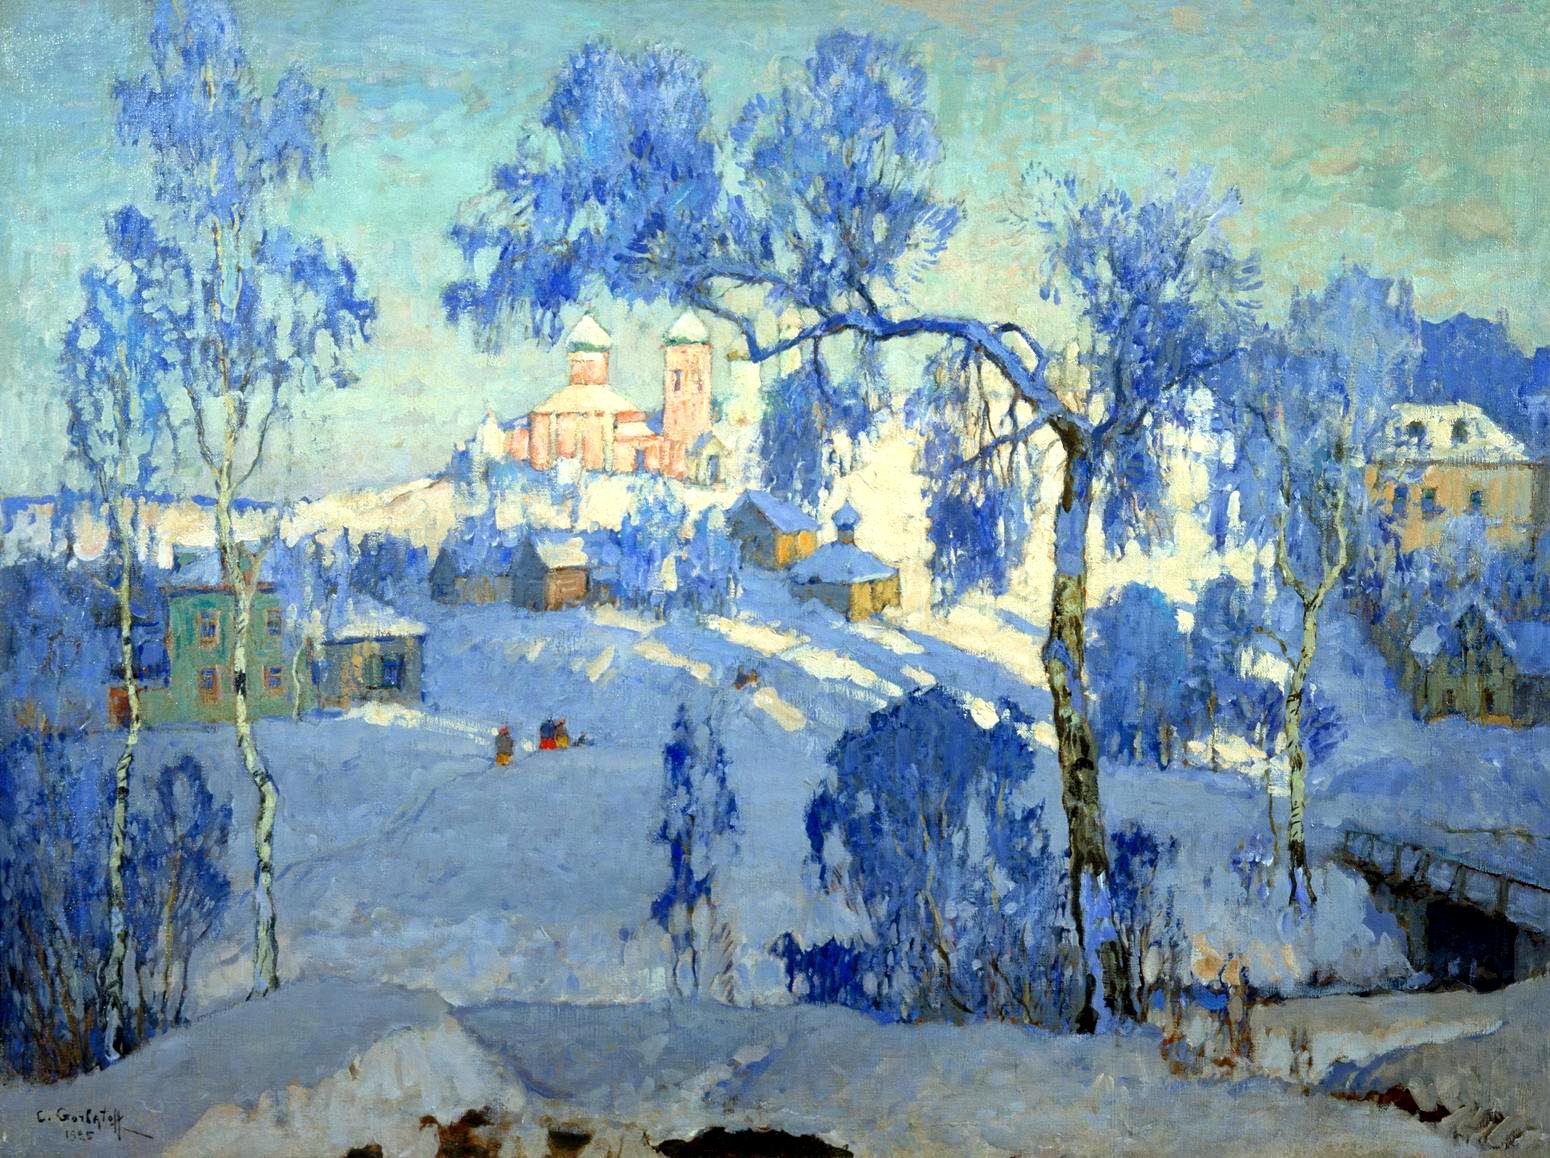 ГОРБАТОВ Константин - Зимний пейзаж с церковью. 1925